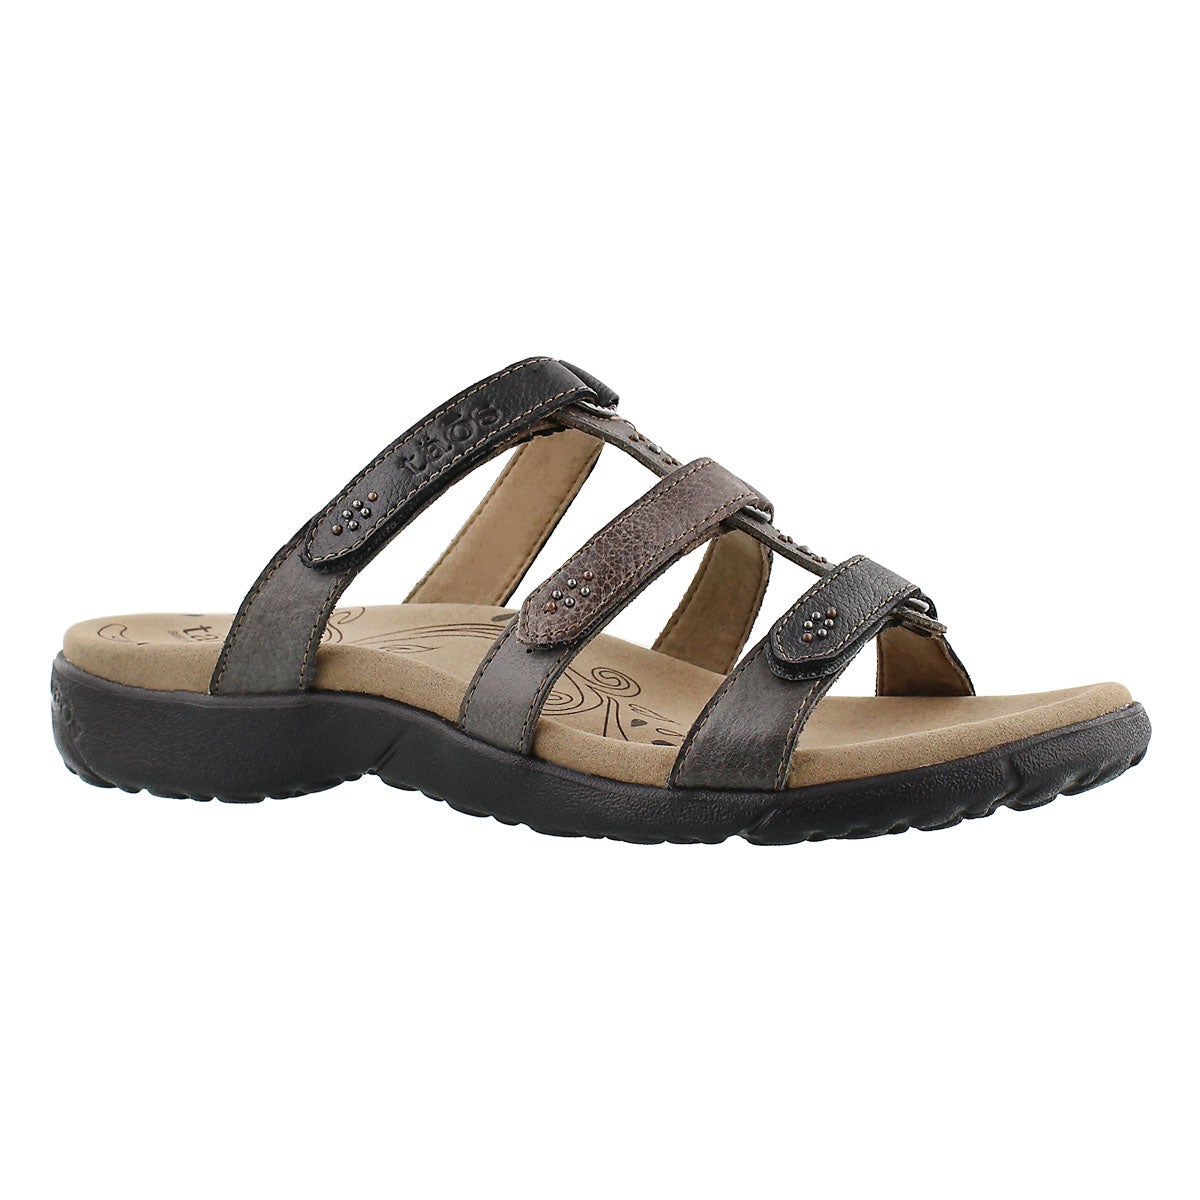 Lds Tribute gry/multi slip on sandal